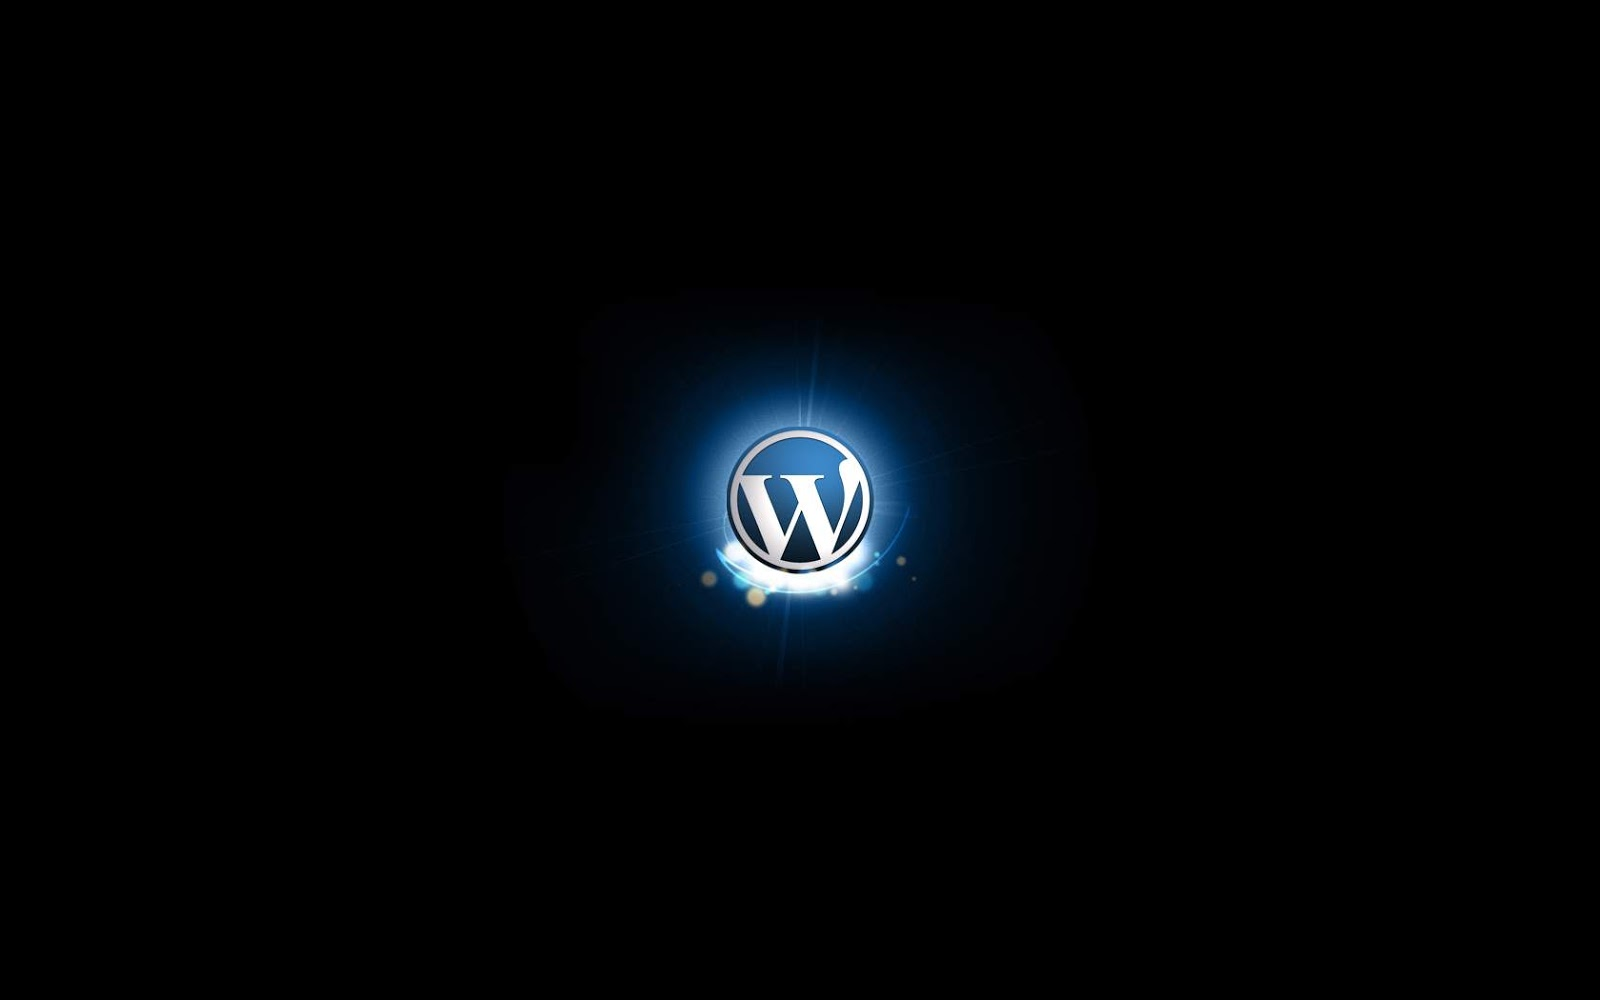 black blue wordpress logo wallpaper hd high quality black blue 1600x1000